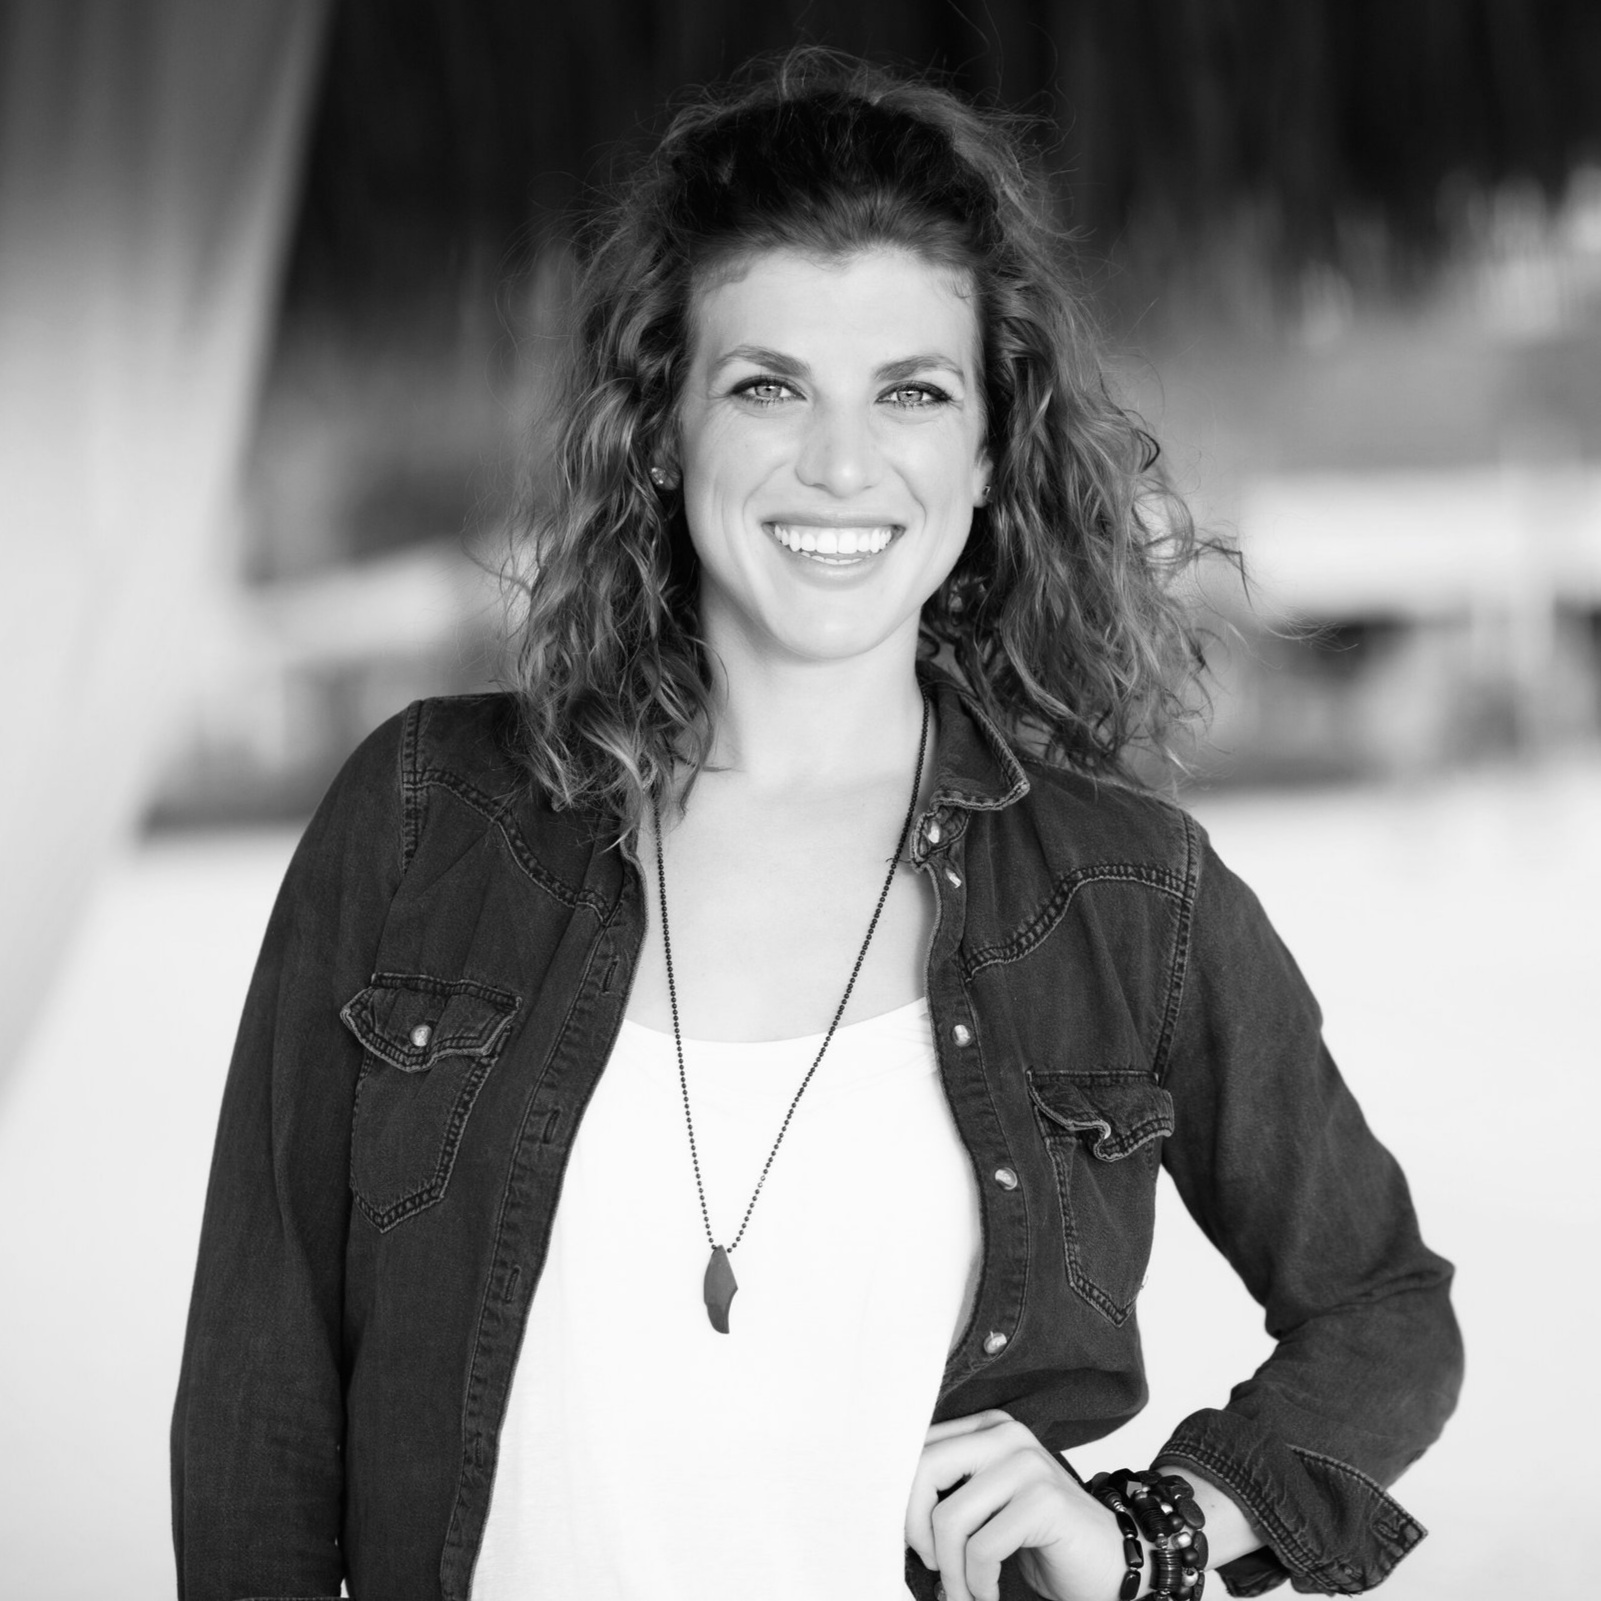 Alana Hilgenberg, Ziggy's Art Bus Board of Directors